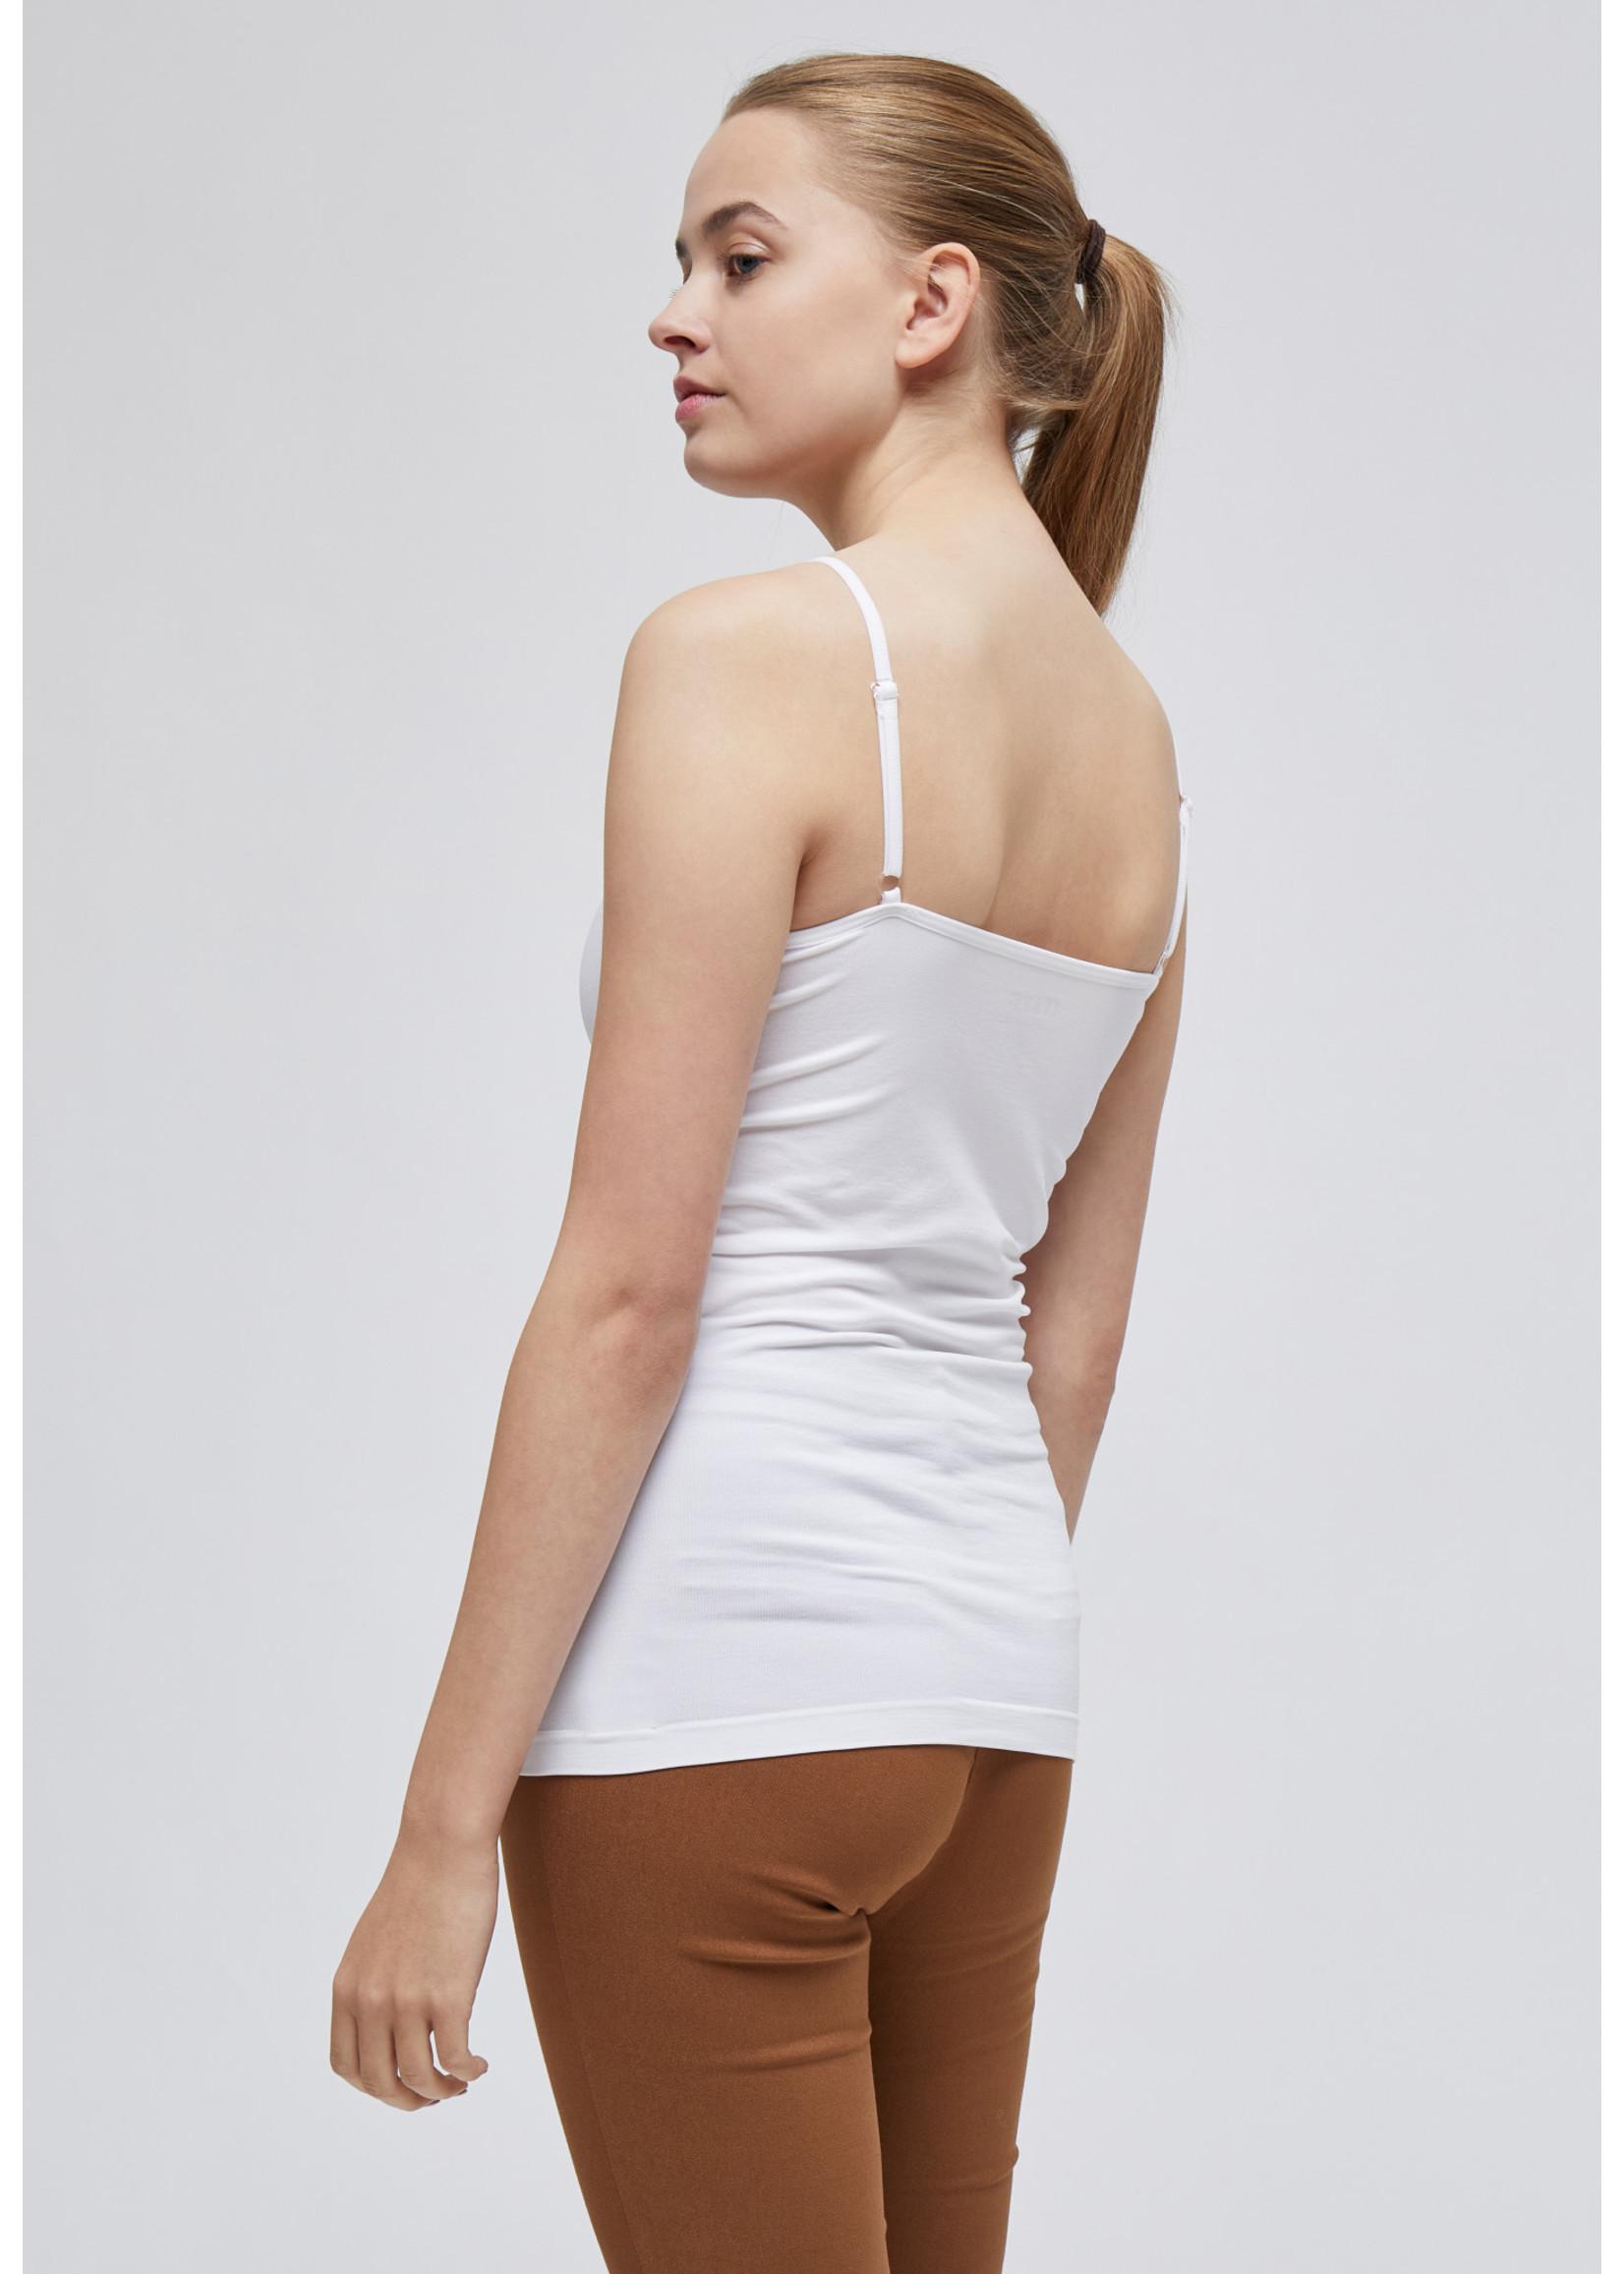 MSCH Celina top White